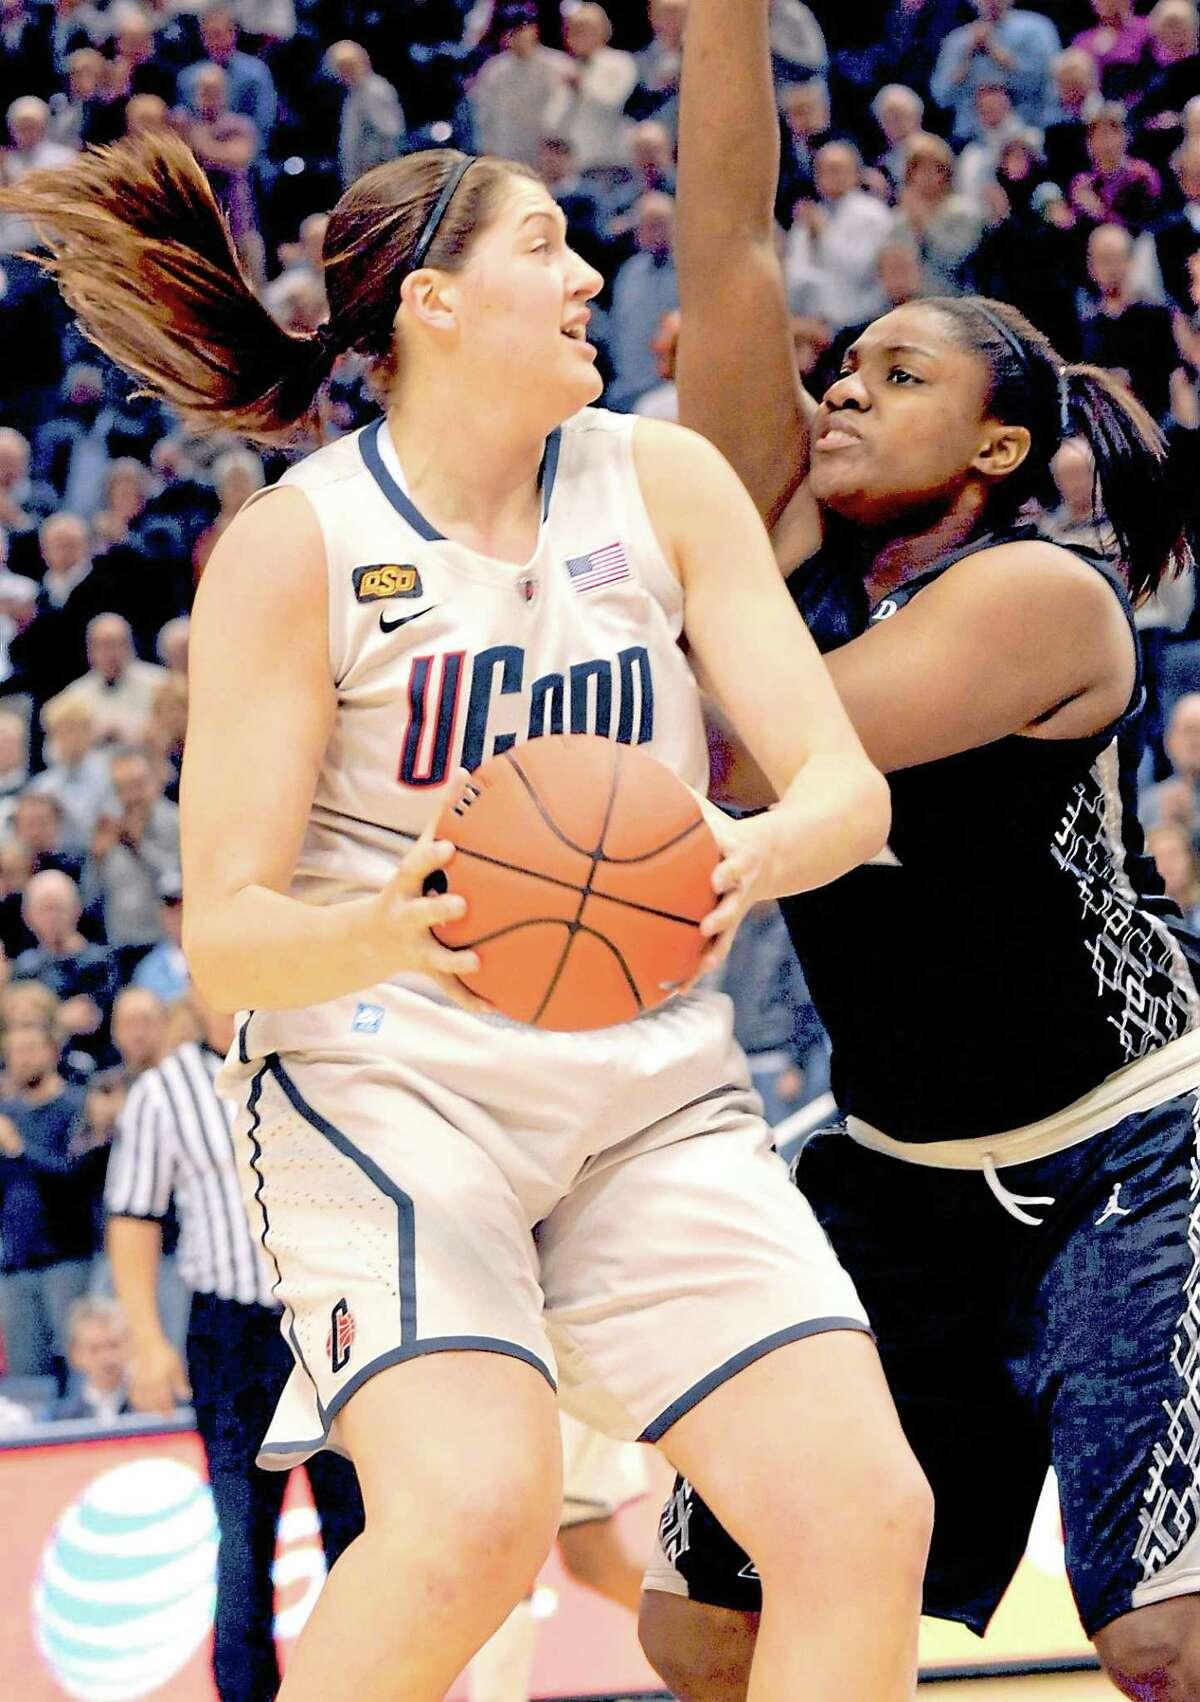 Hamden native and Hopkins grad Lauren Okafor defends UConn's Stefanie Dolson during a 2012 game in Hartford.